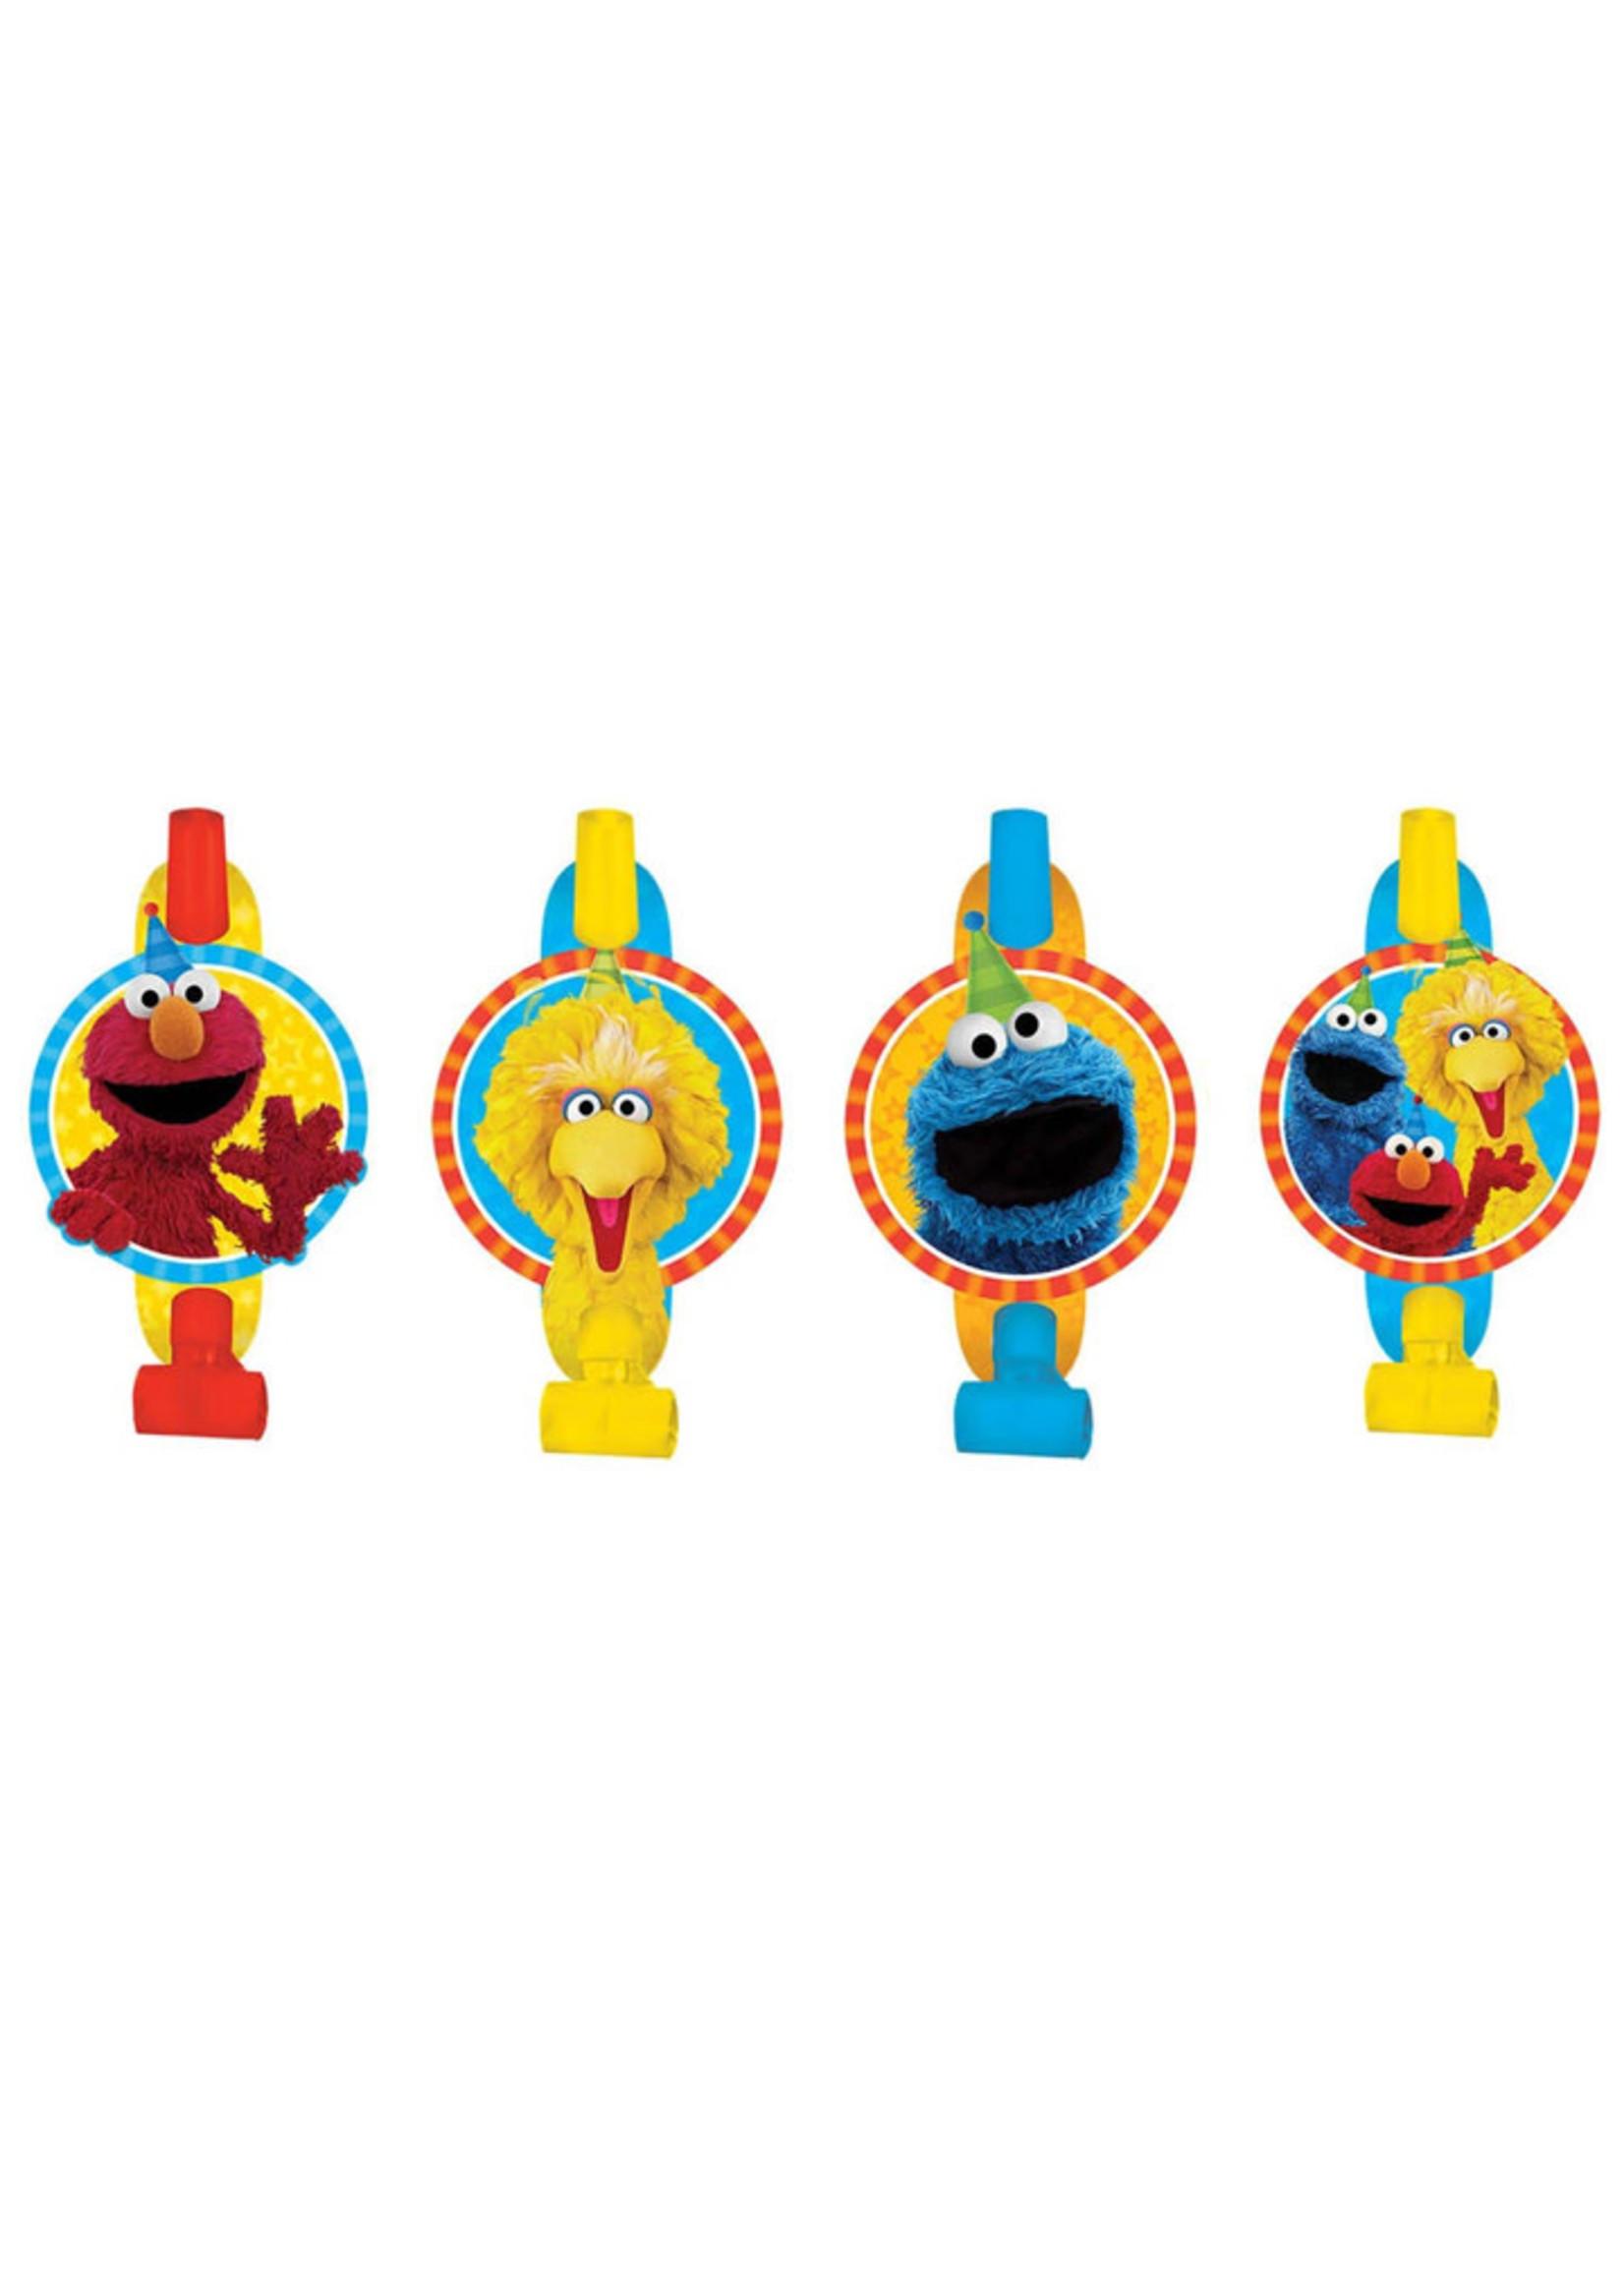 Sesame Street Blowouts - 8ct